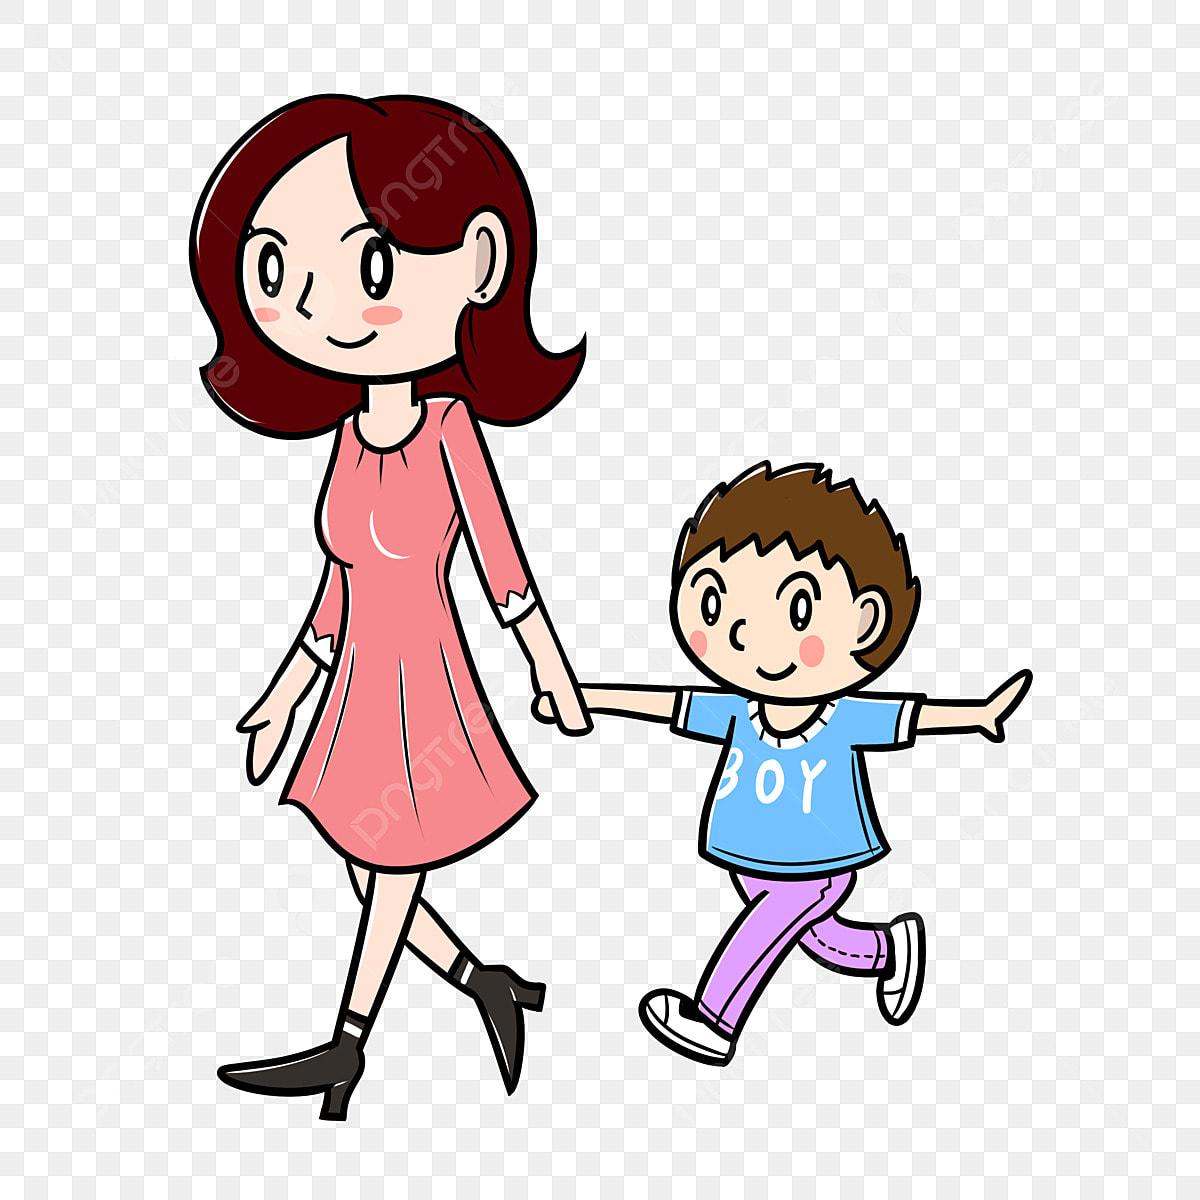 Kartun Hari Ibu Ibu Dan Anak Ibu Dan Anak Kartun Hari Ibu